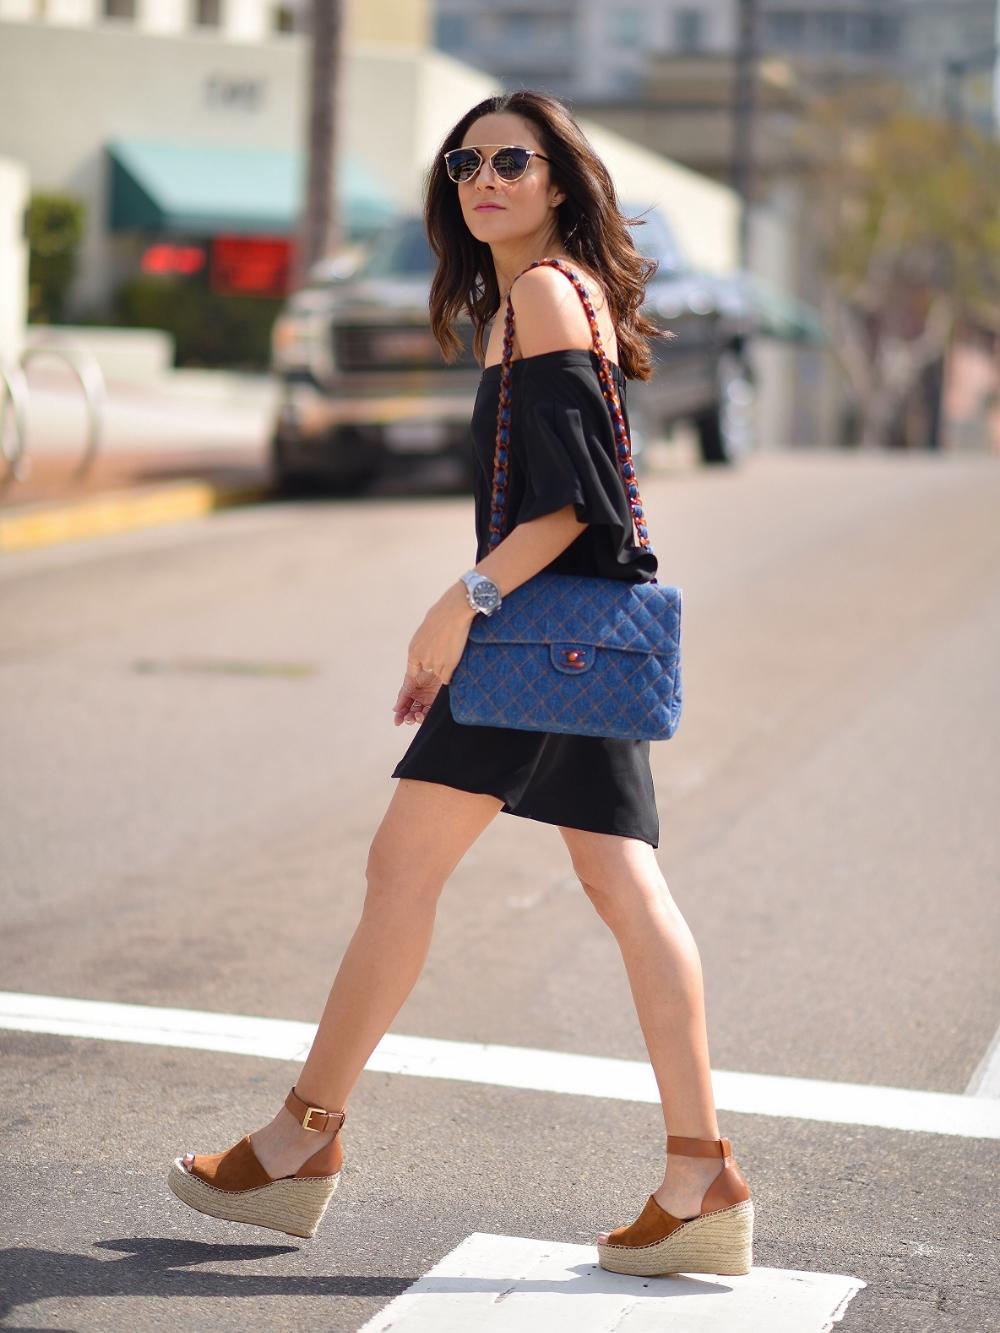 MLM_Paris&MeBoutique_FashionBlogger_Chanel_DesignerVault_SanDiego_MarcFisher.jpg